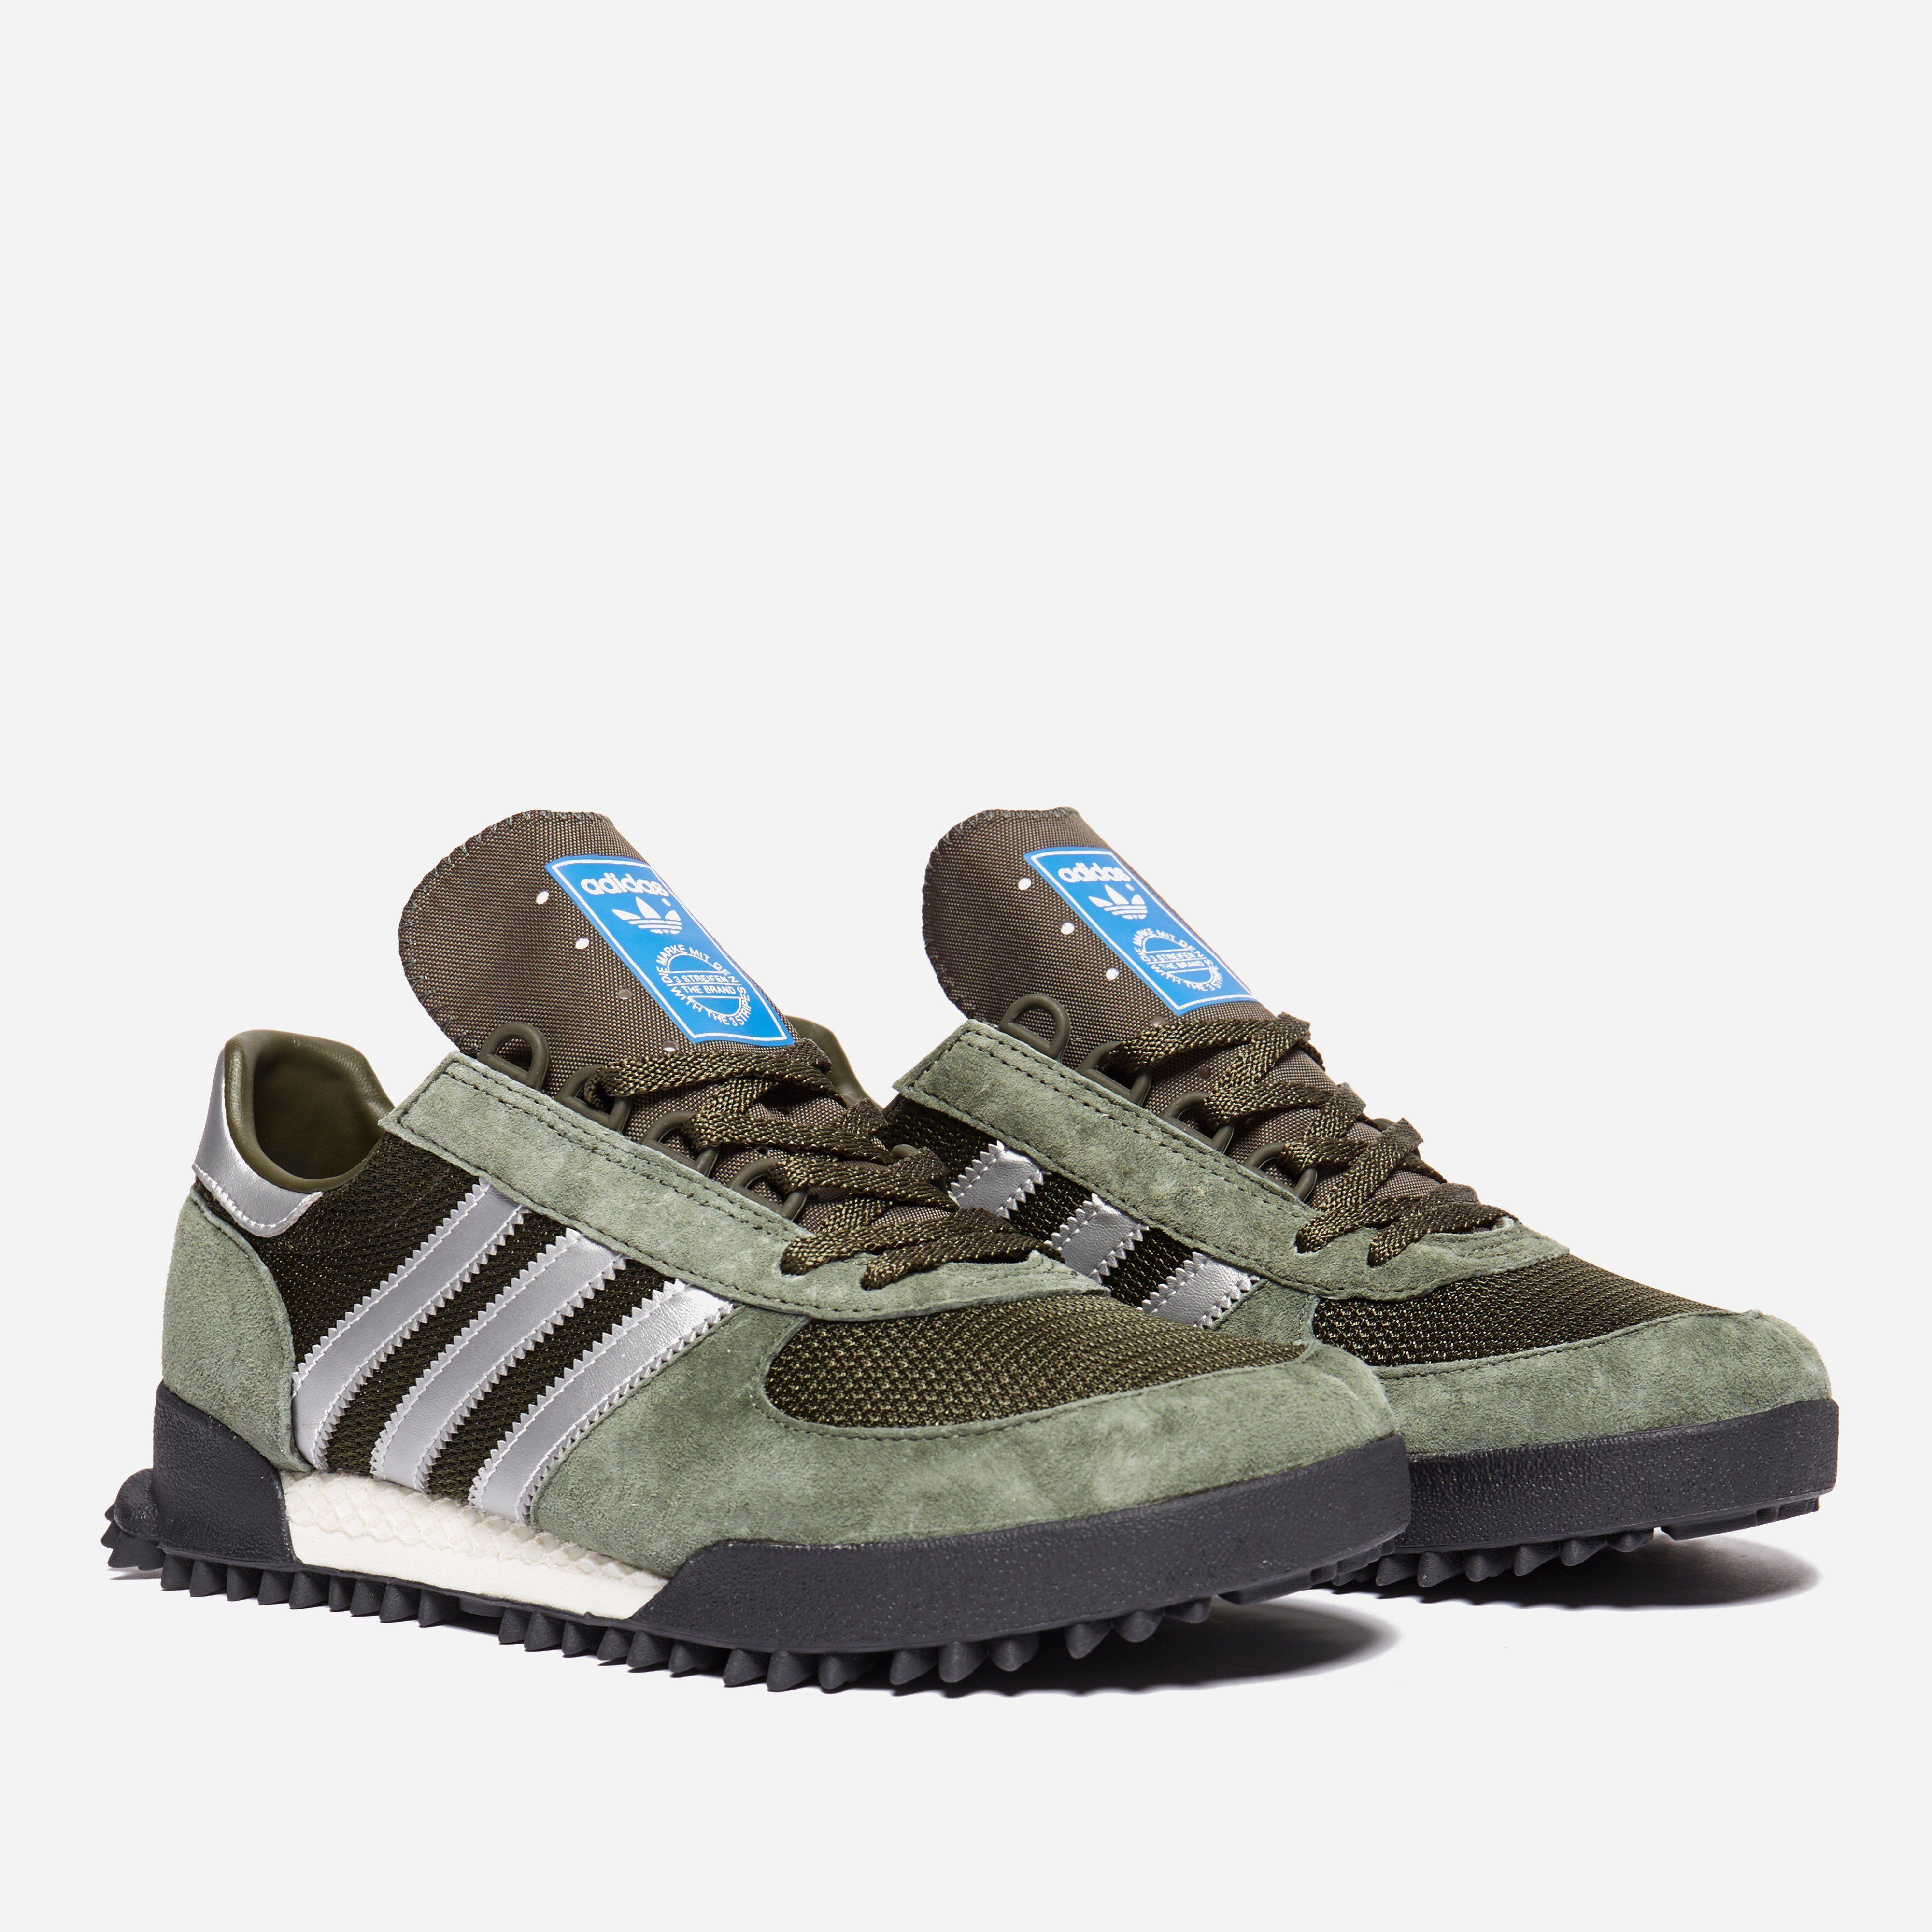 adidas Originals Marathon TR From The Hip Store